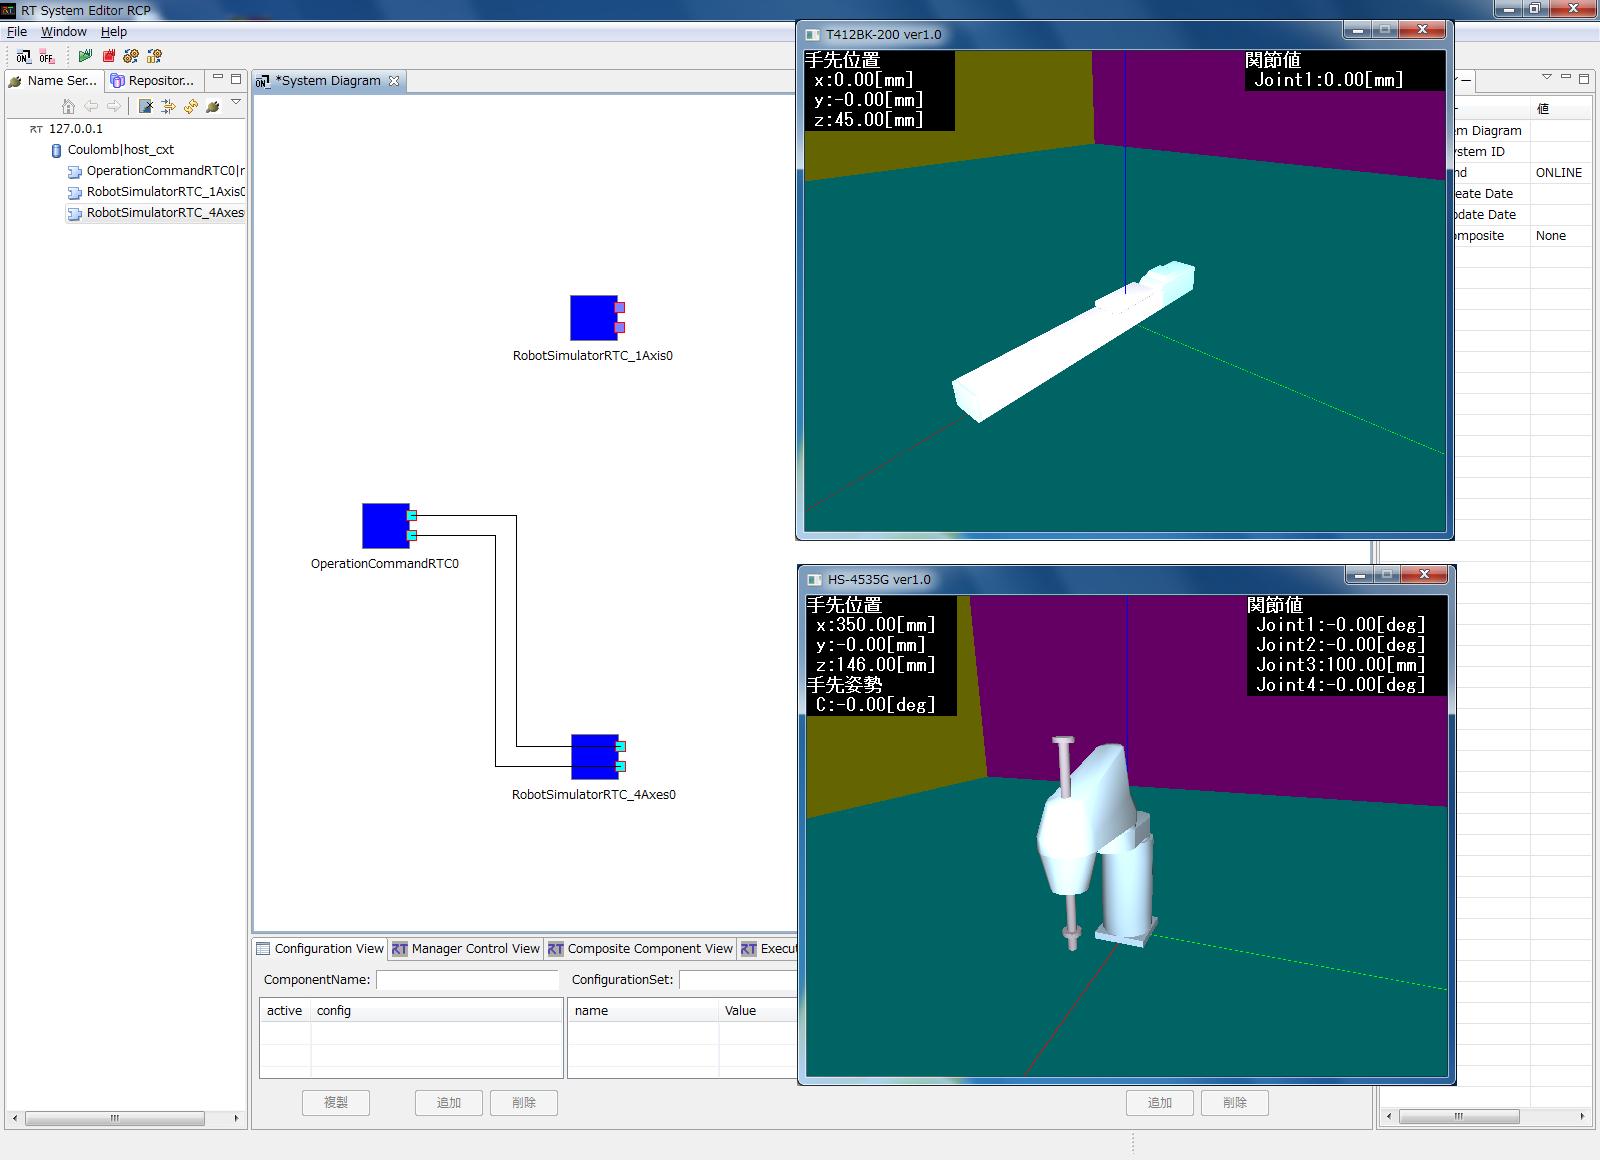 RTミドルウエアの産業応用を目的としたロボットアーム制御機能共通I/F拡張の提案